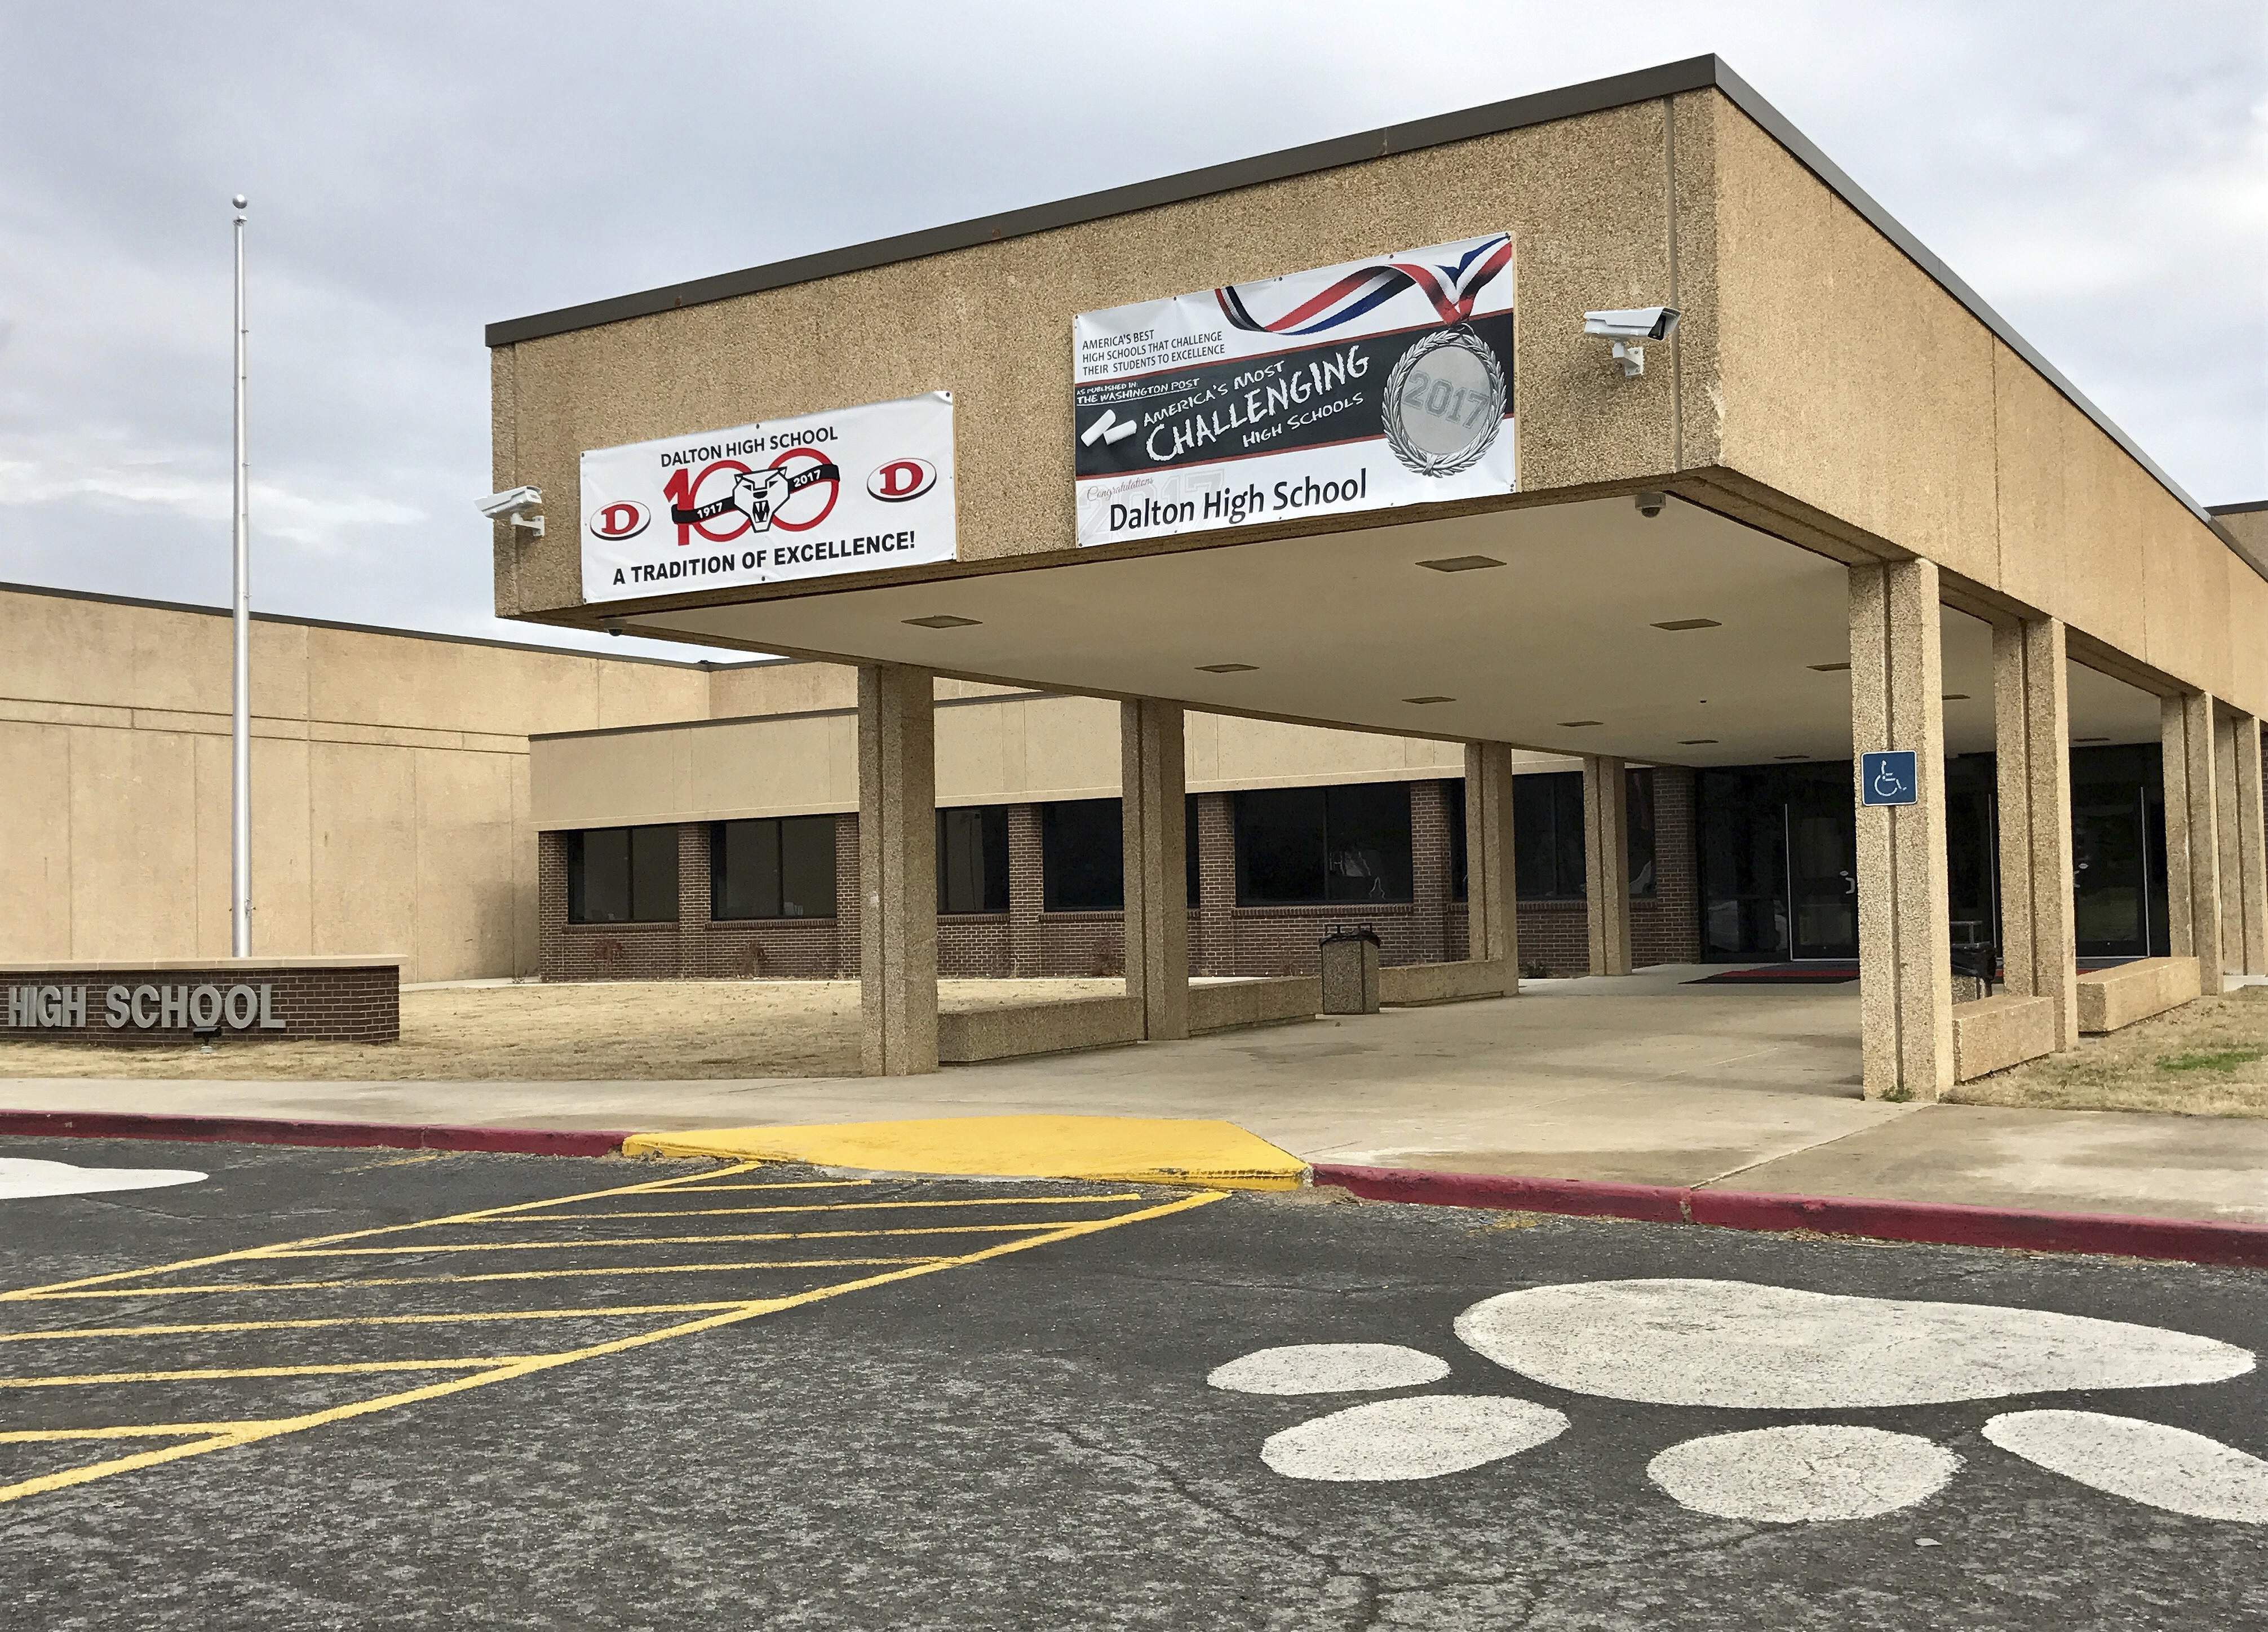 Georgia teacher in custody after report of shots at school